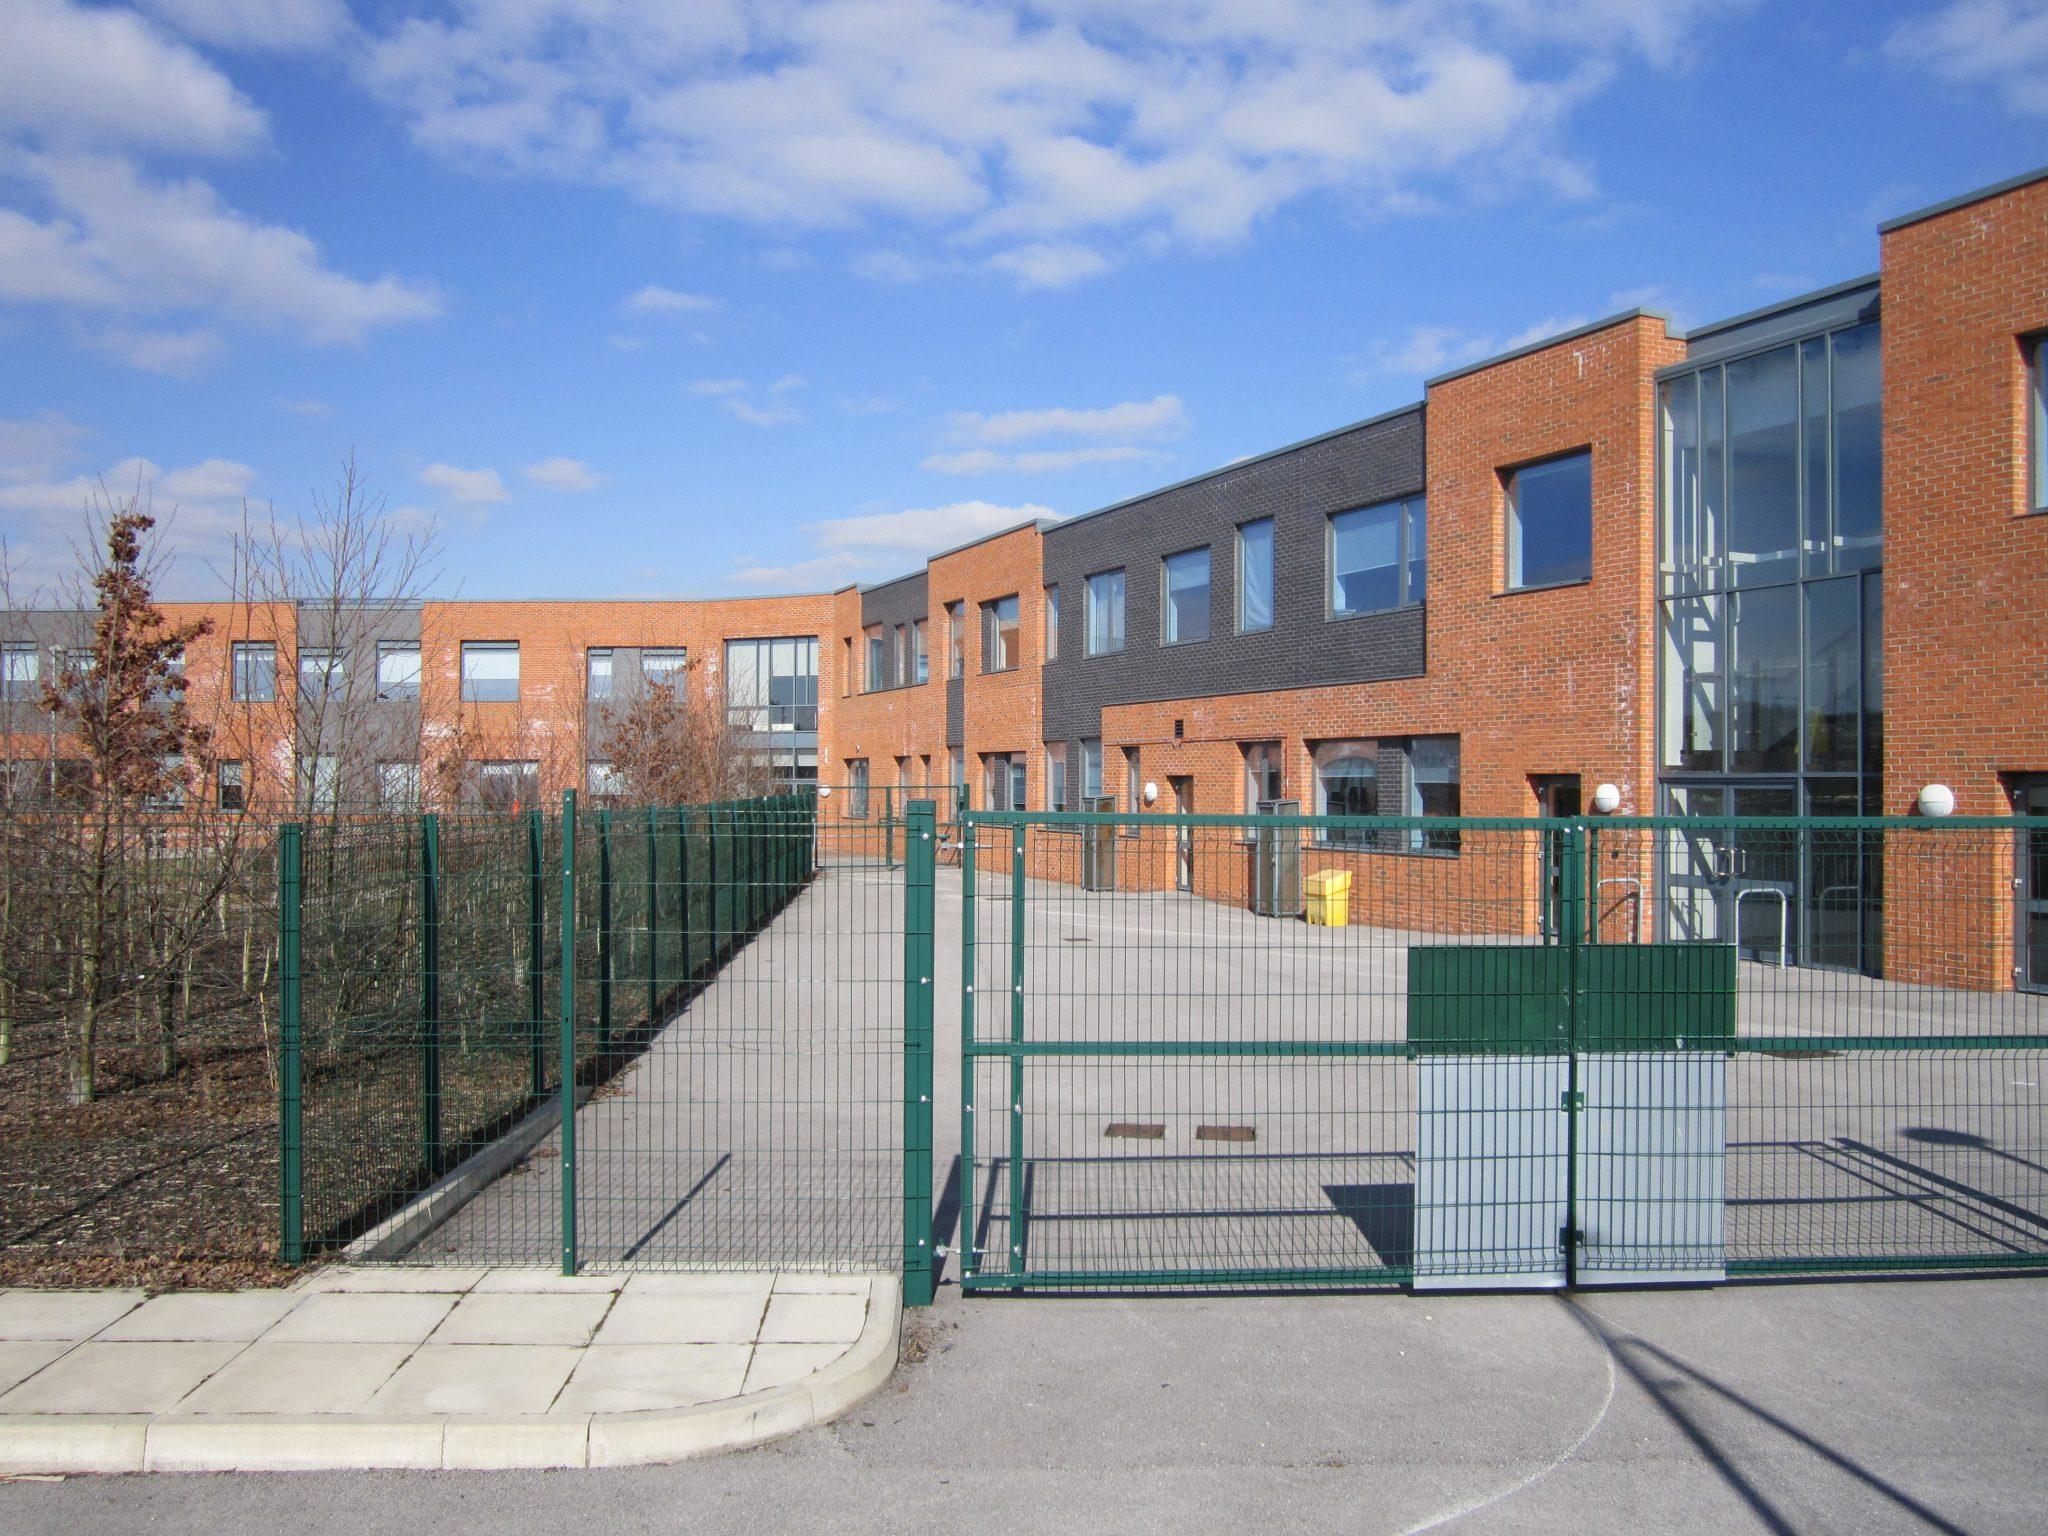 woodchurch school